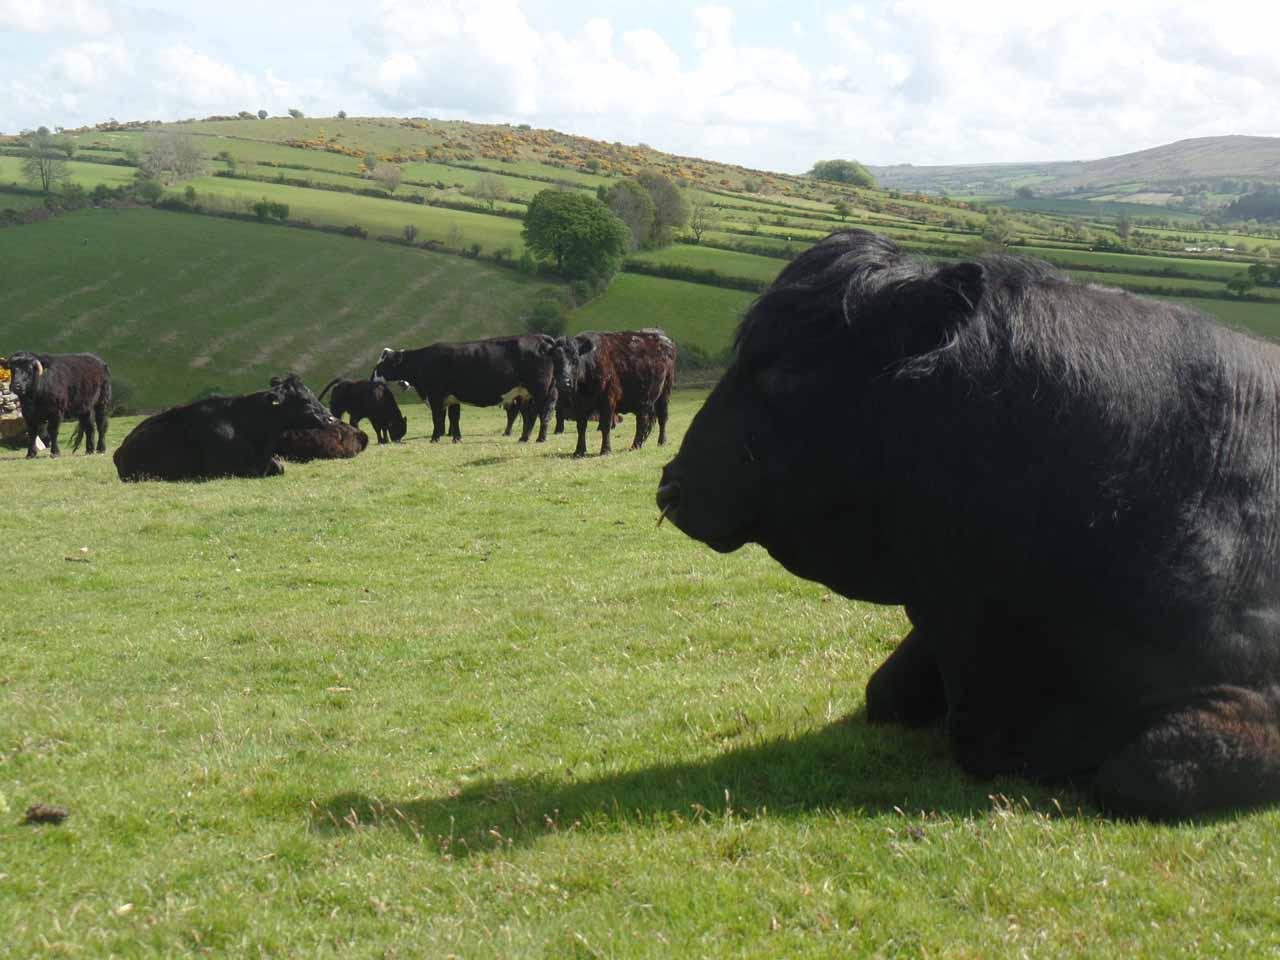 Welsh Black cattle